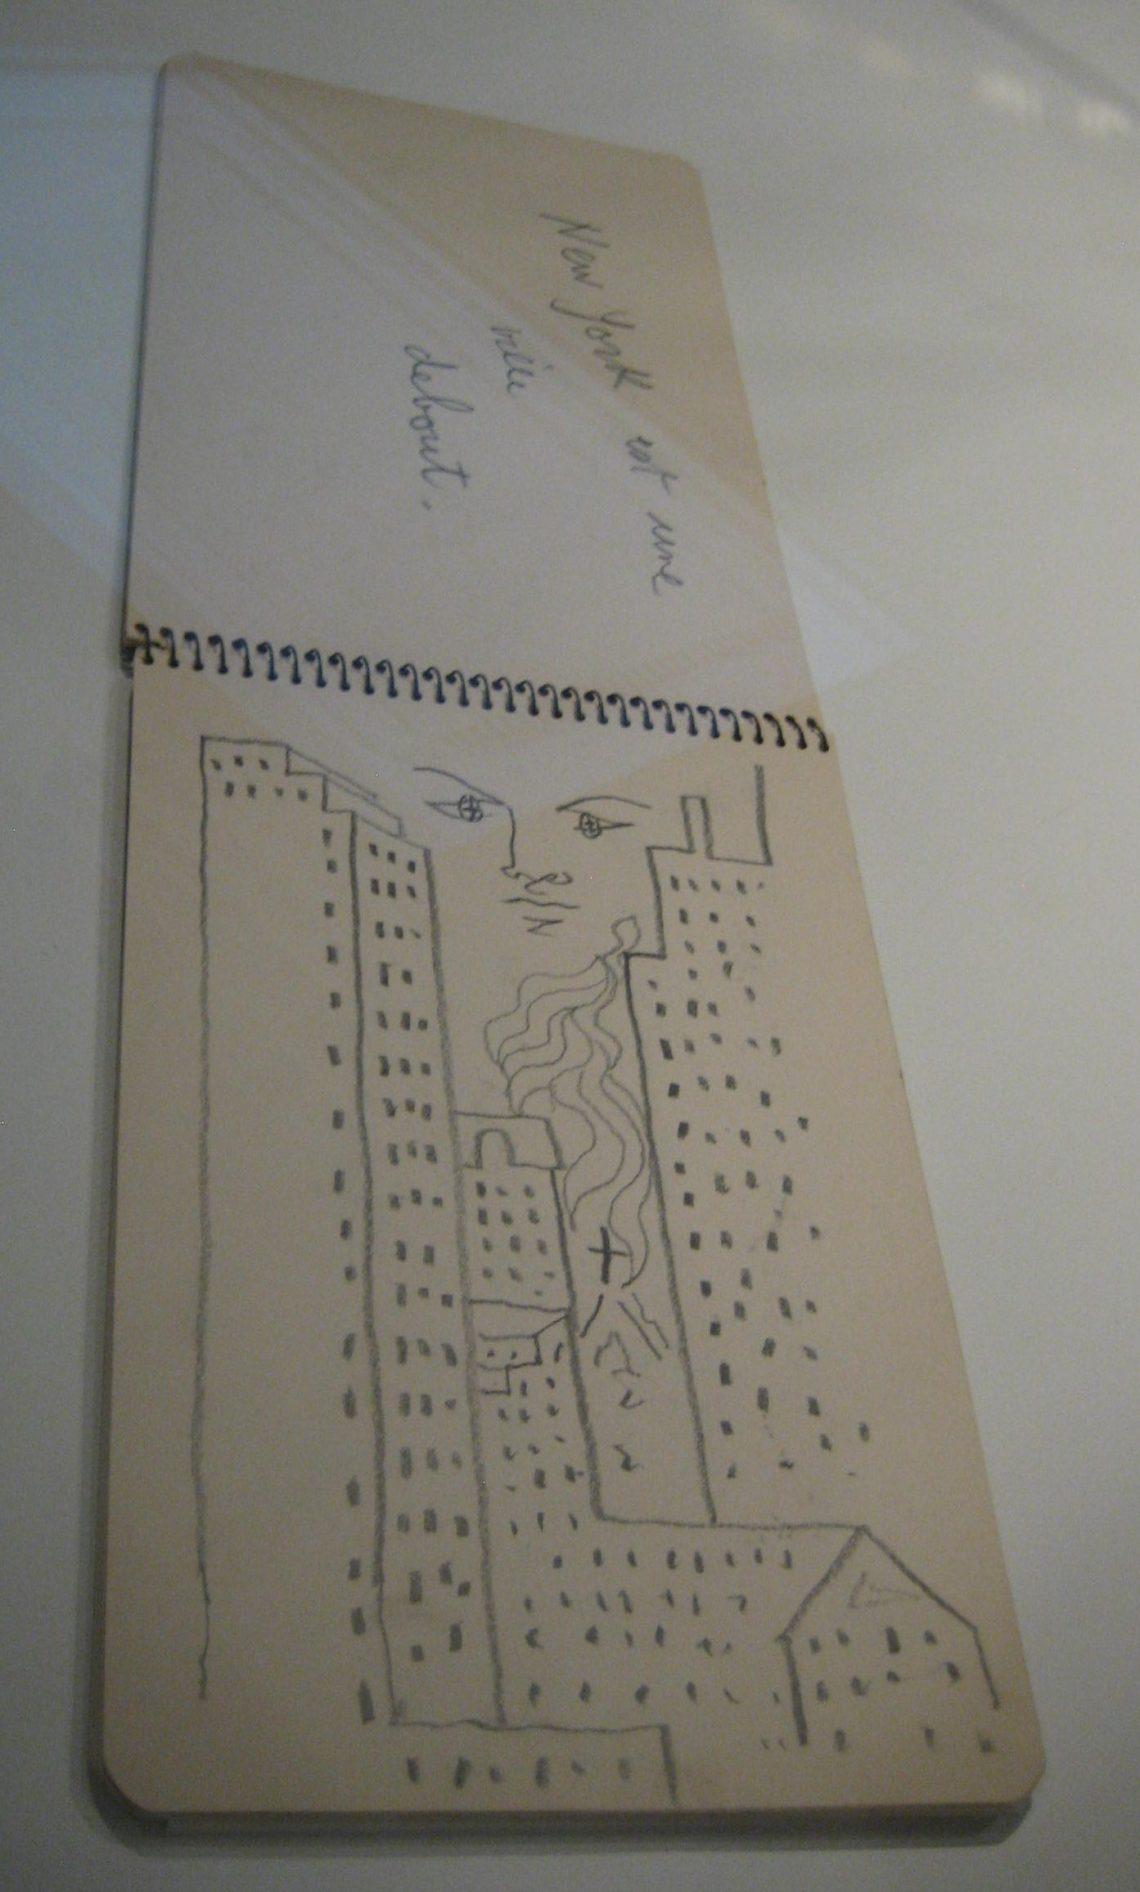 Jean Cocteau, schetsboek. Foto Esther Doornbusch, 2 december 2018, CC BY 4.0